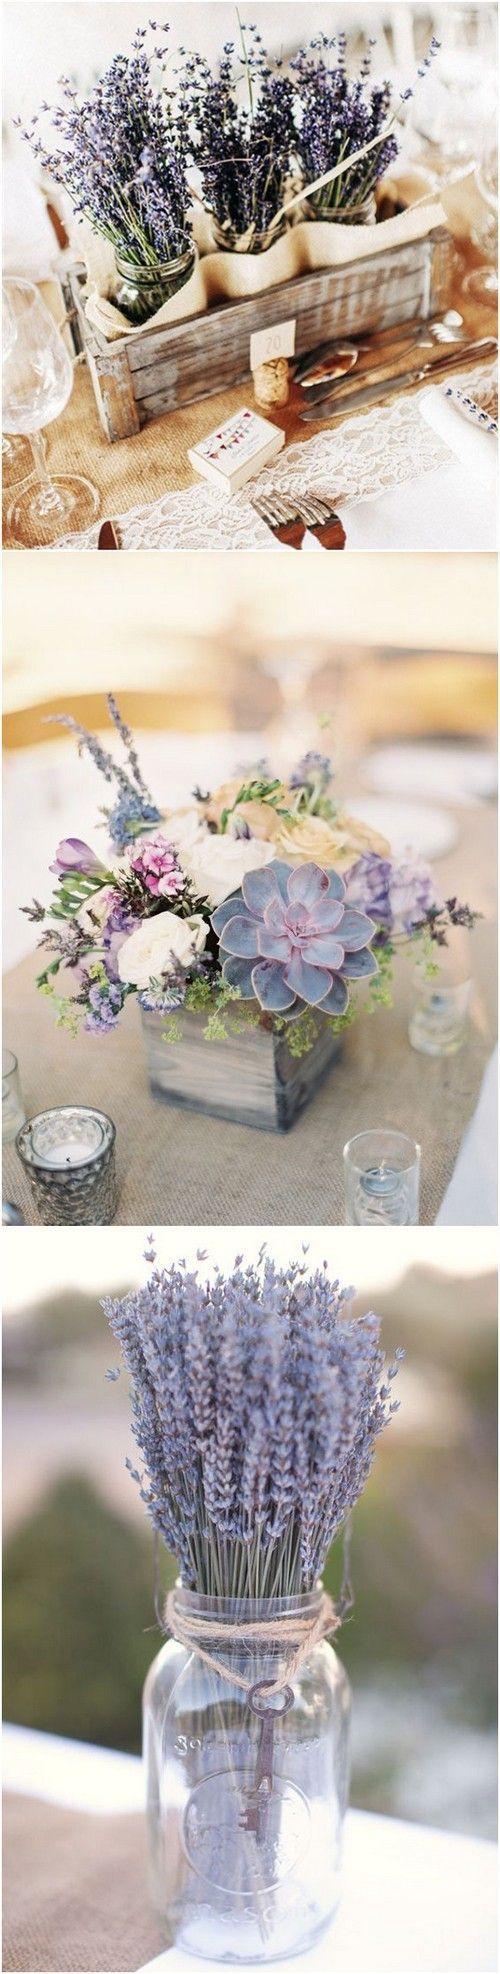 lavender themed wedding centerpiece ideas